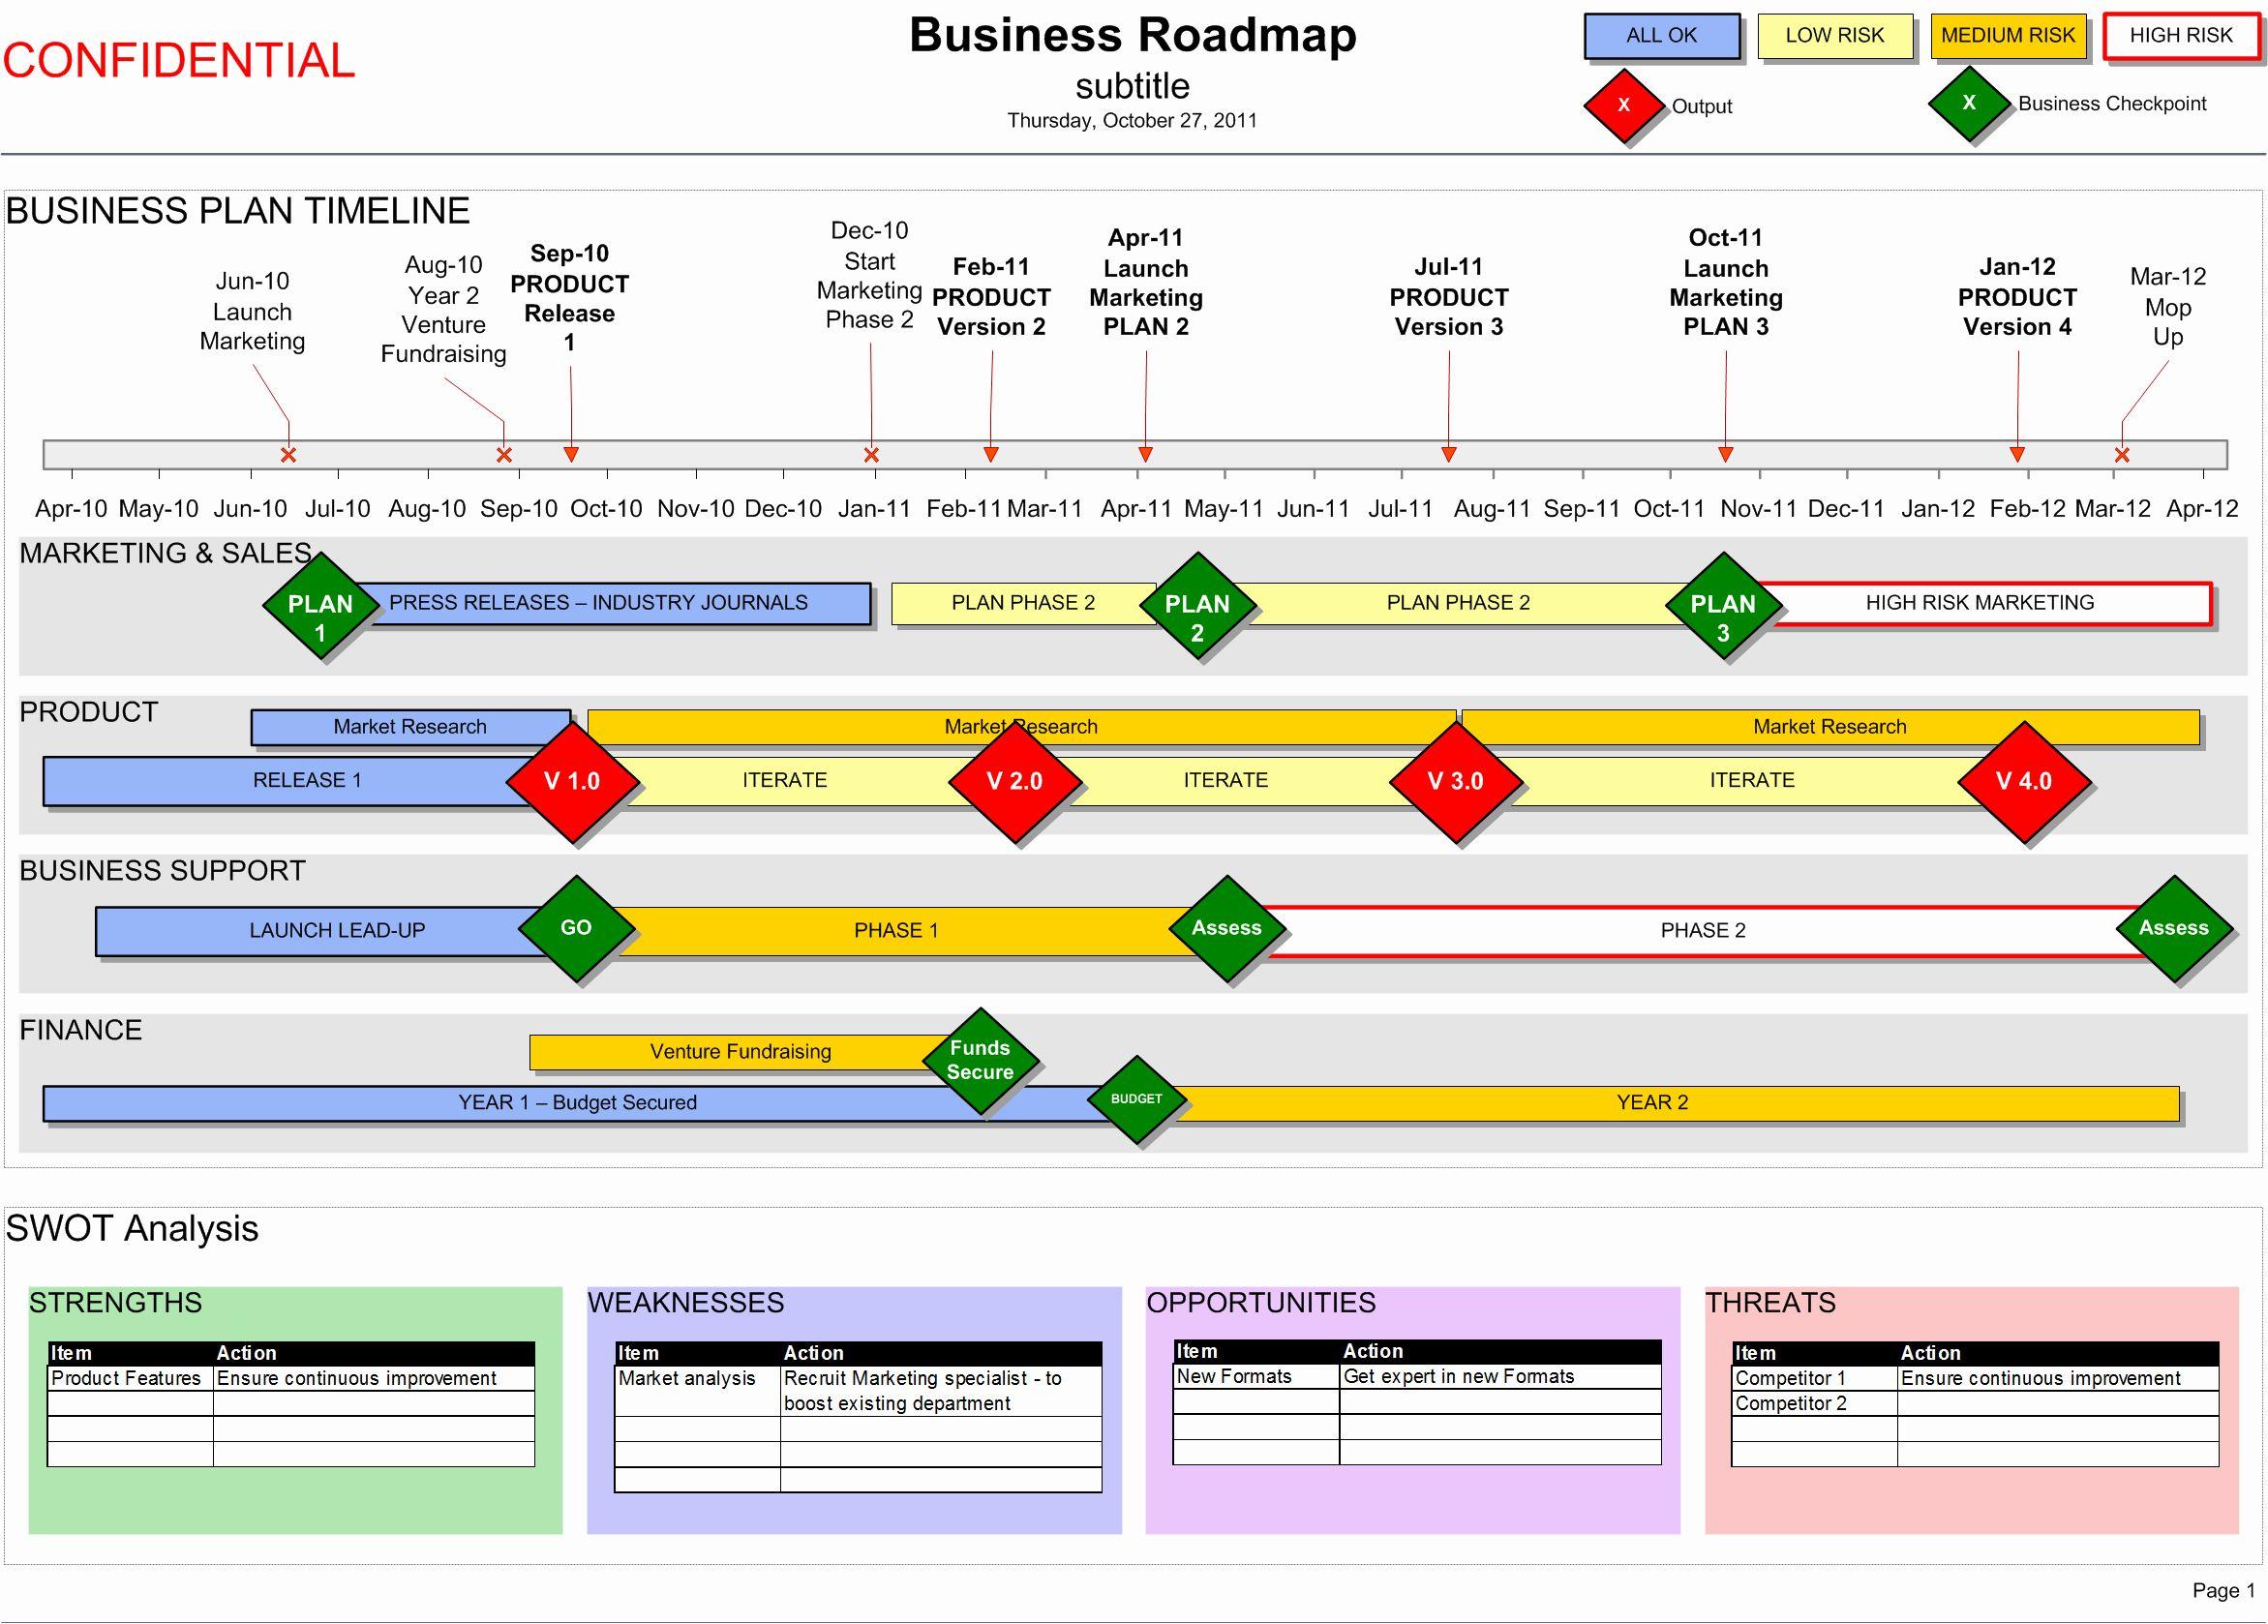 Strategic Plan Timeline Template Inspirational Business Roadmap